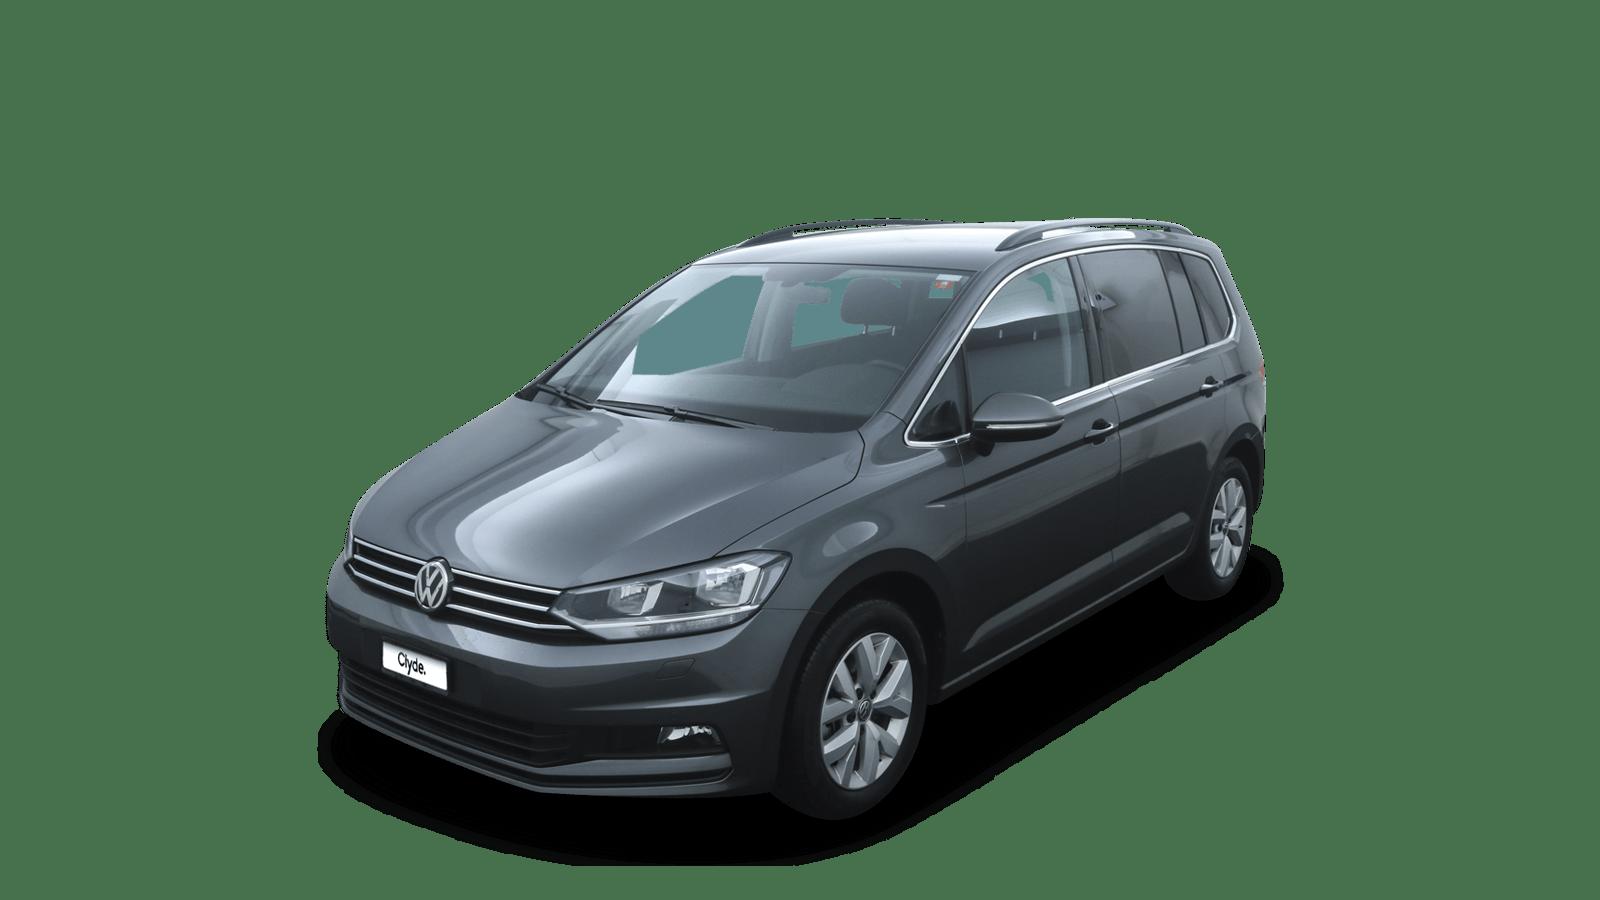 VW Touran Grau front - Clyde Auto-Abo